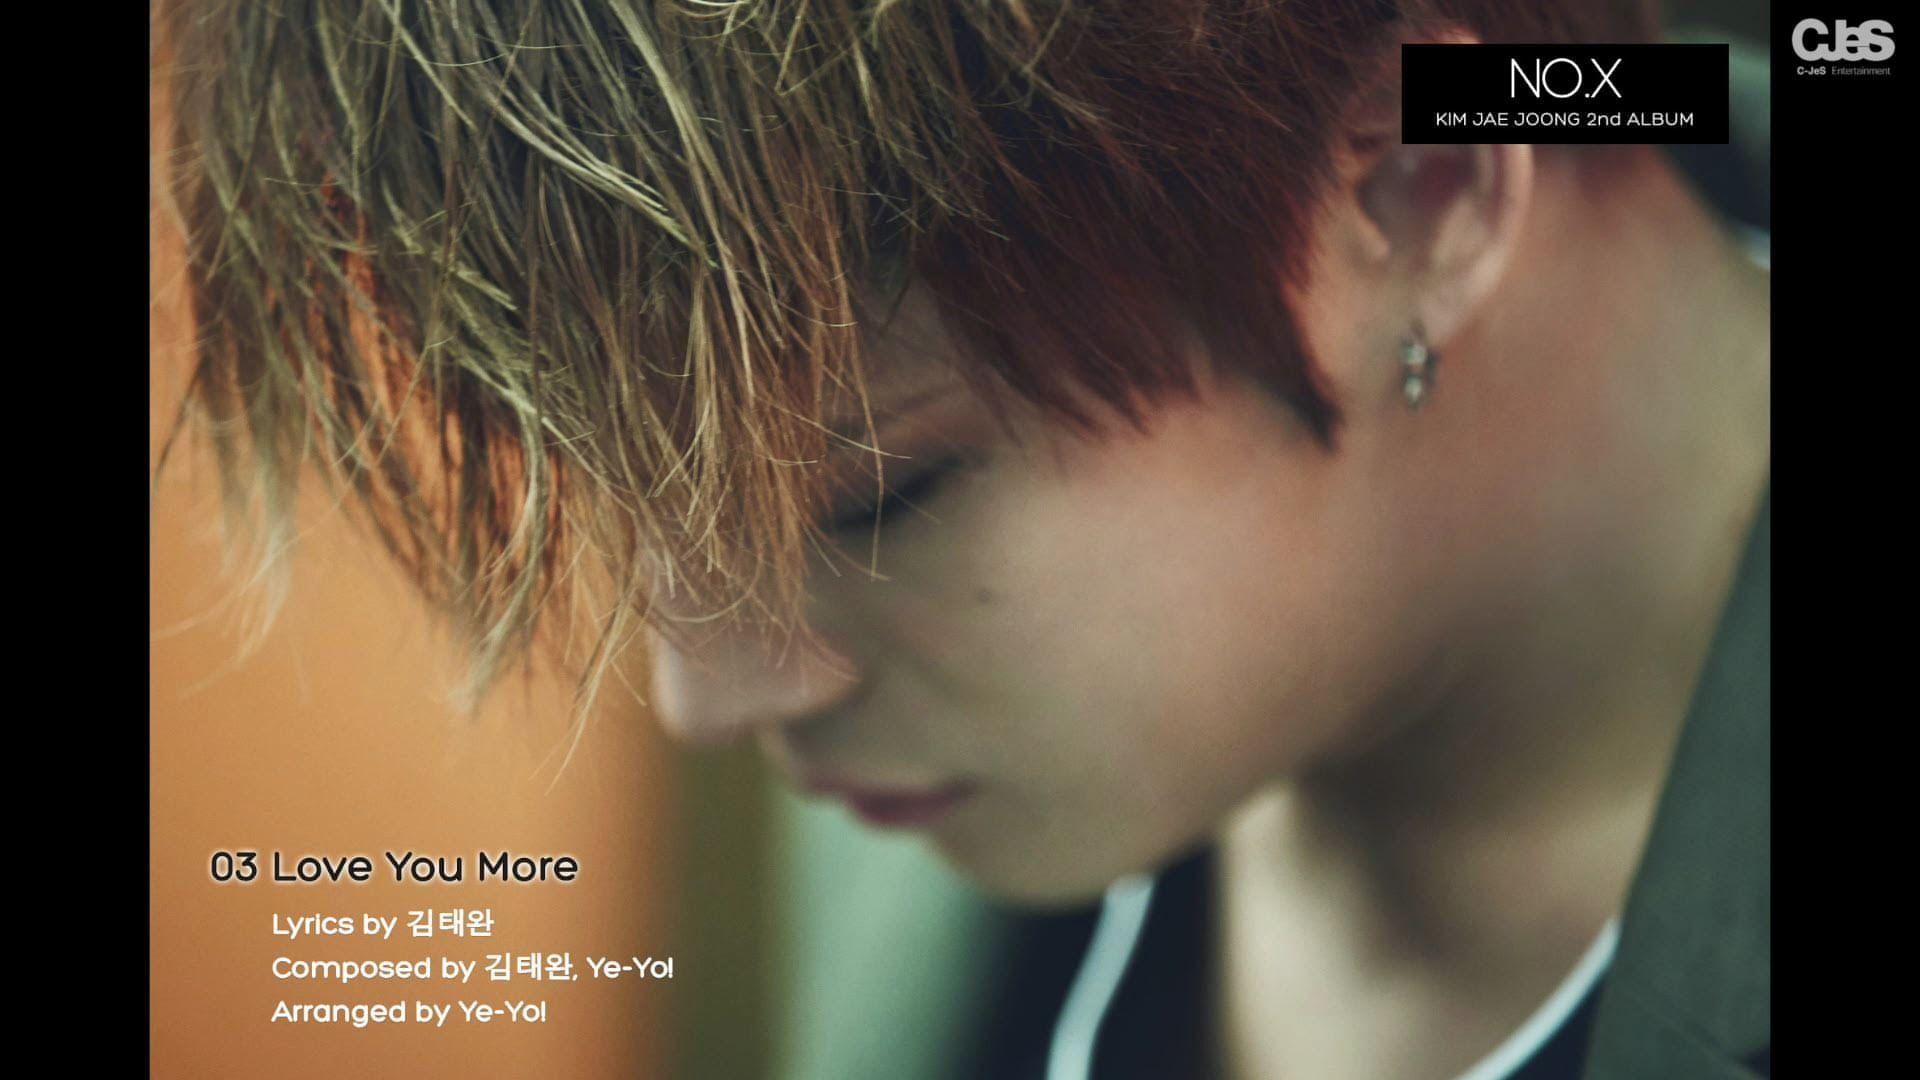 [Pre-listening] 김재중(KIM JAE JOONG) - 2nd Album 녹스(NO.X) 미리듣기